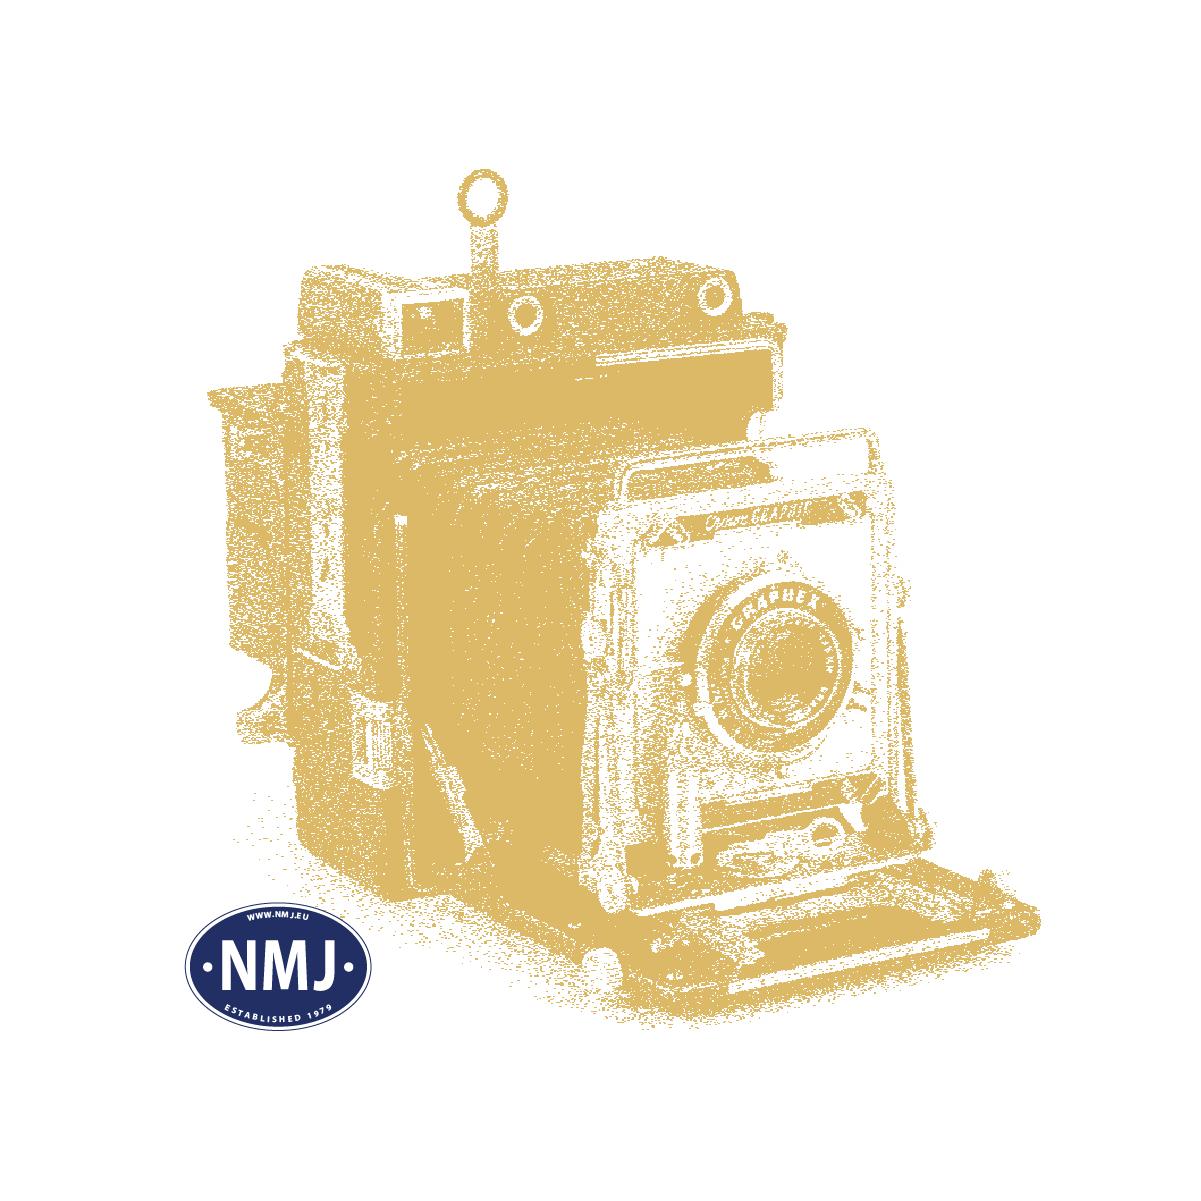 NMJT83.113 - NMJ Topline NSB SKD224.223, rotbraun, DCC Digital